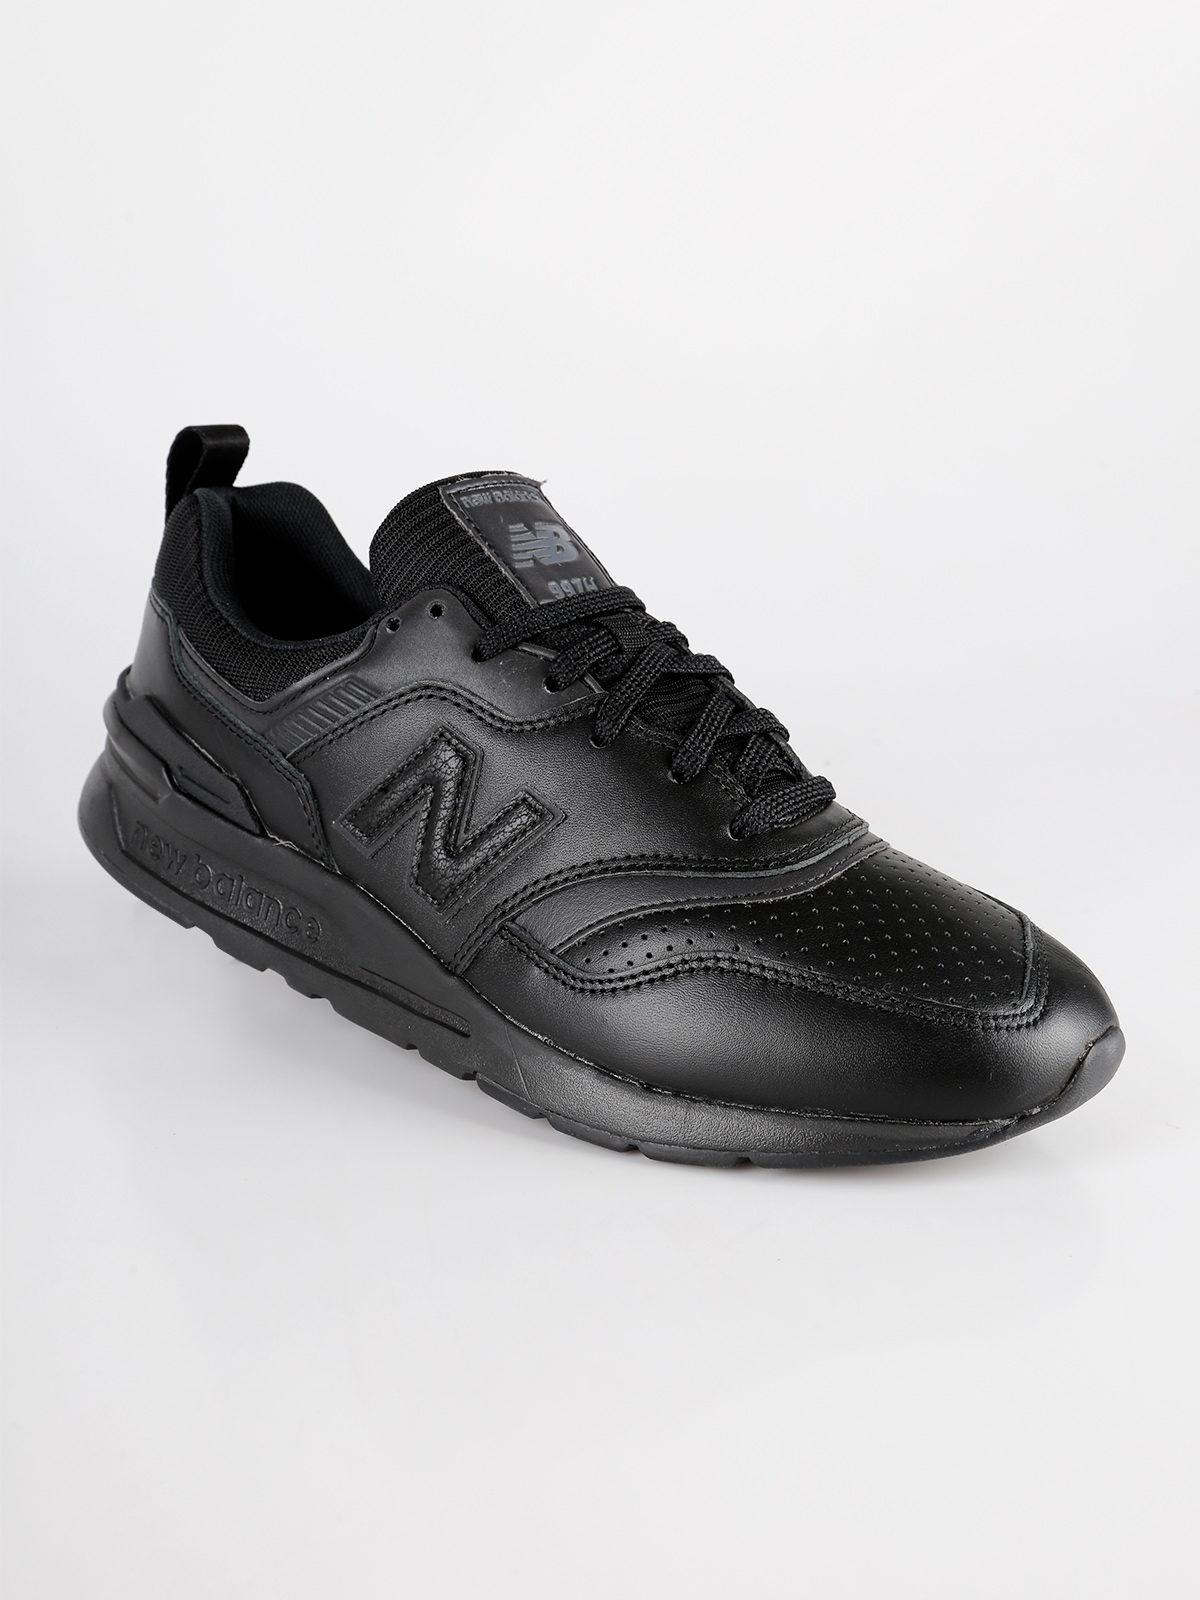 scarpe uomo new balance nera pelle